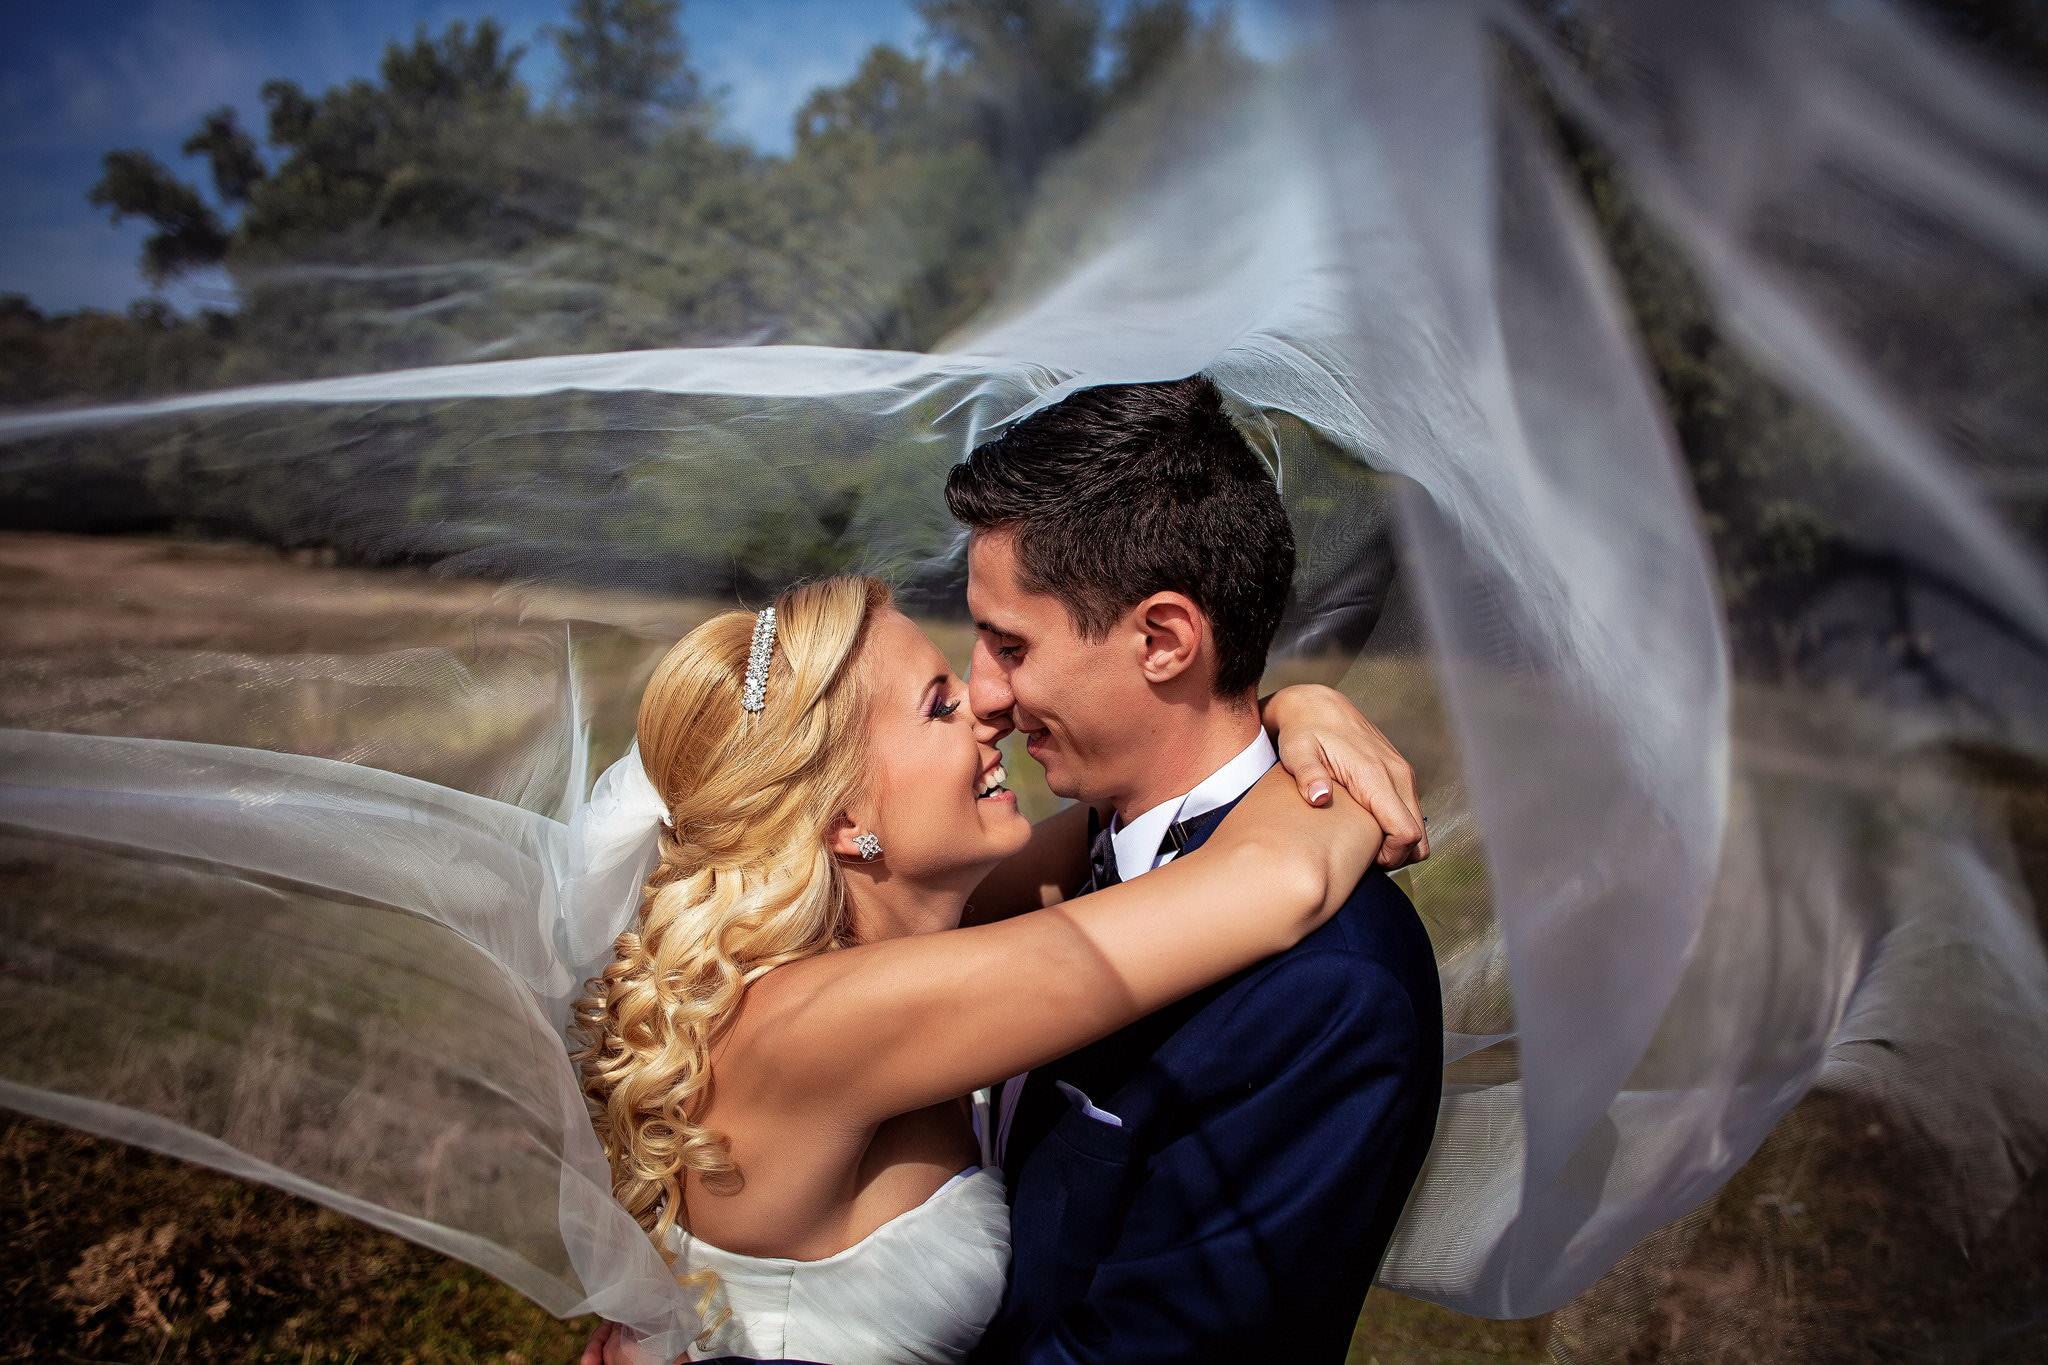 Raluca+Andrei, fotografie de nunta, fotograf de nunta Ploiesti, sedinta foto, wedding, after wedding, fotograf profesionist, sedinta foto nunta, inspirephoto.ro, fotografii creative